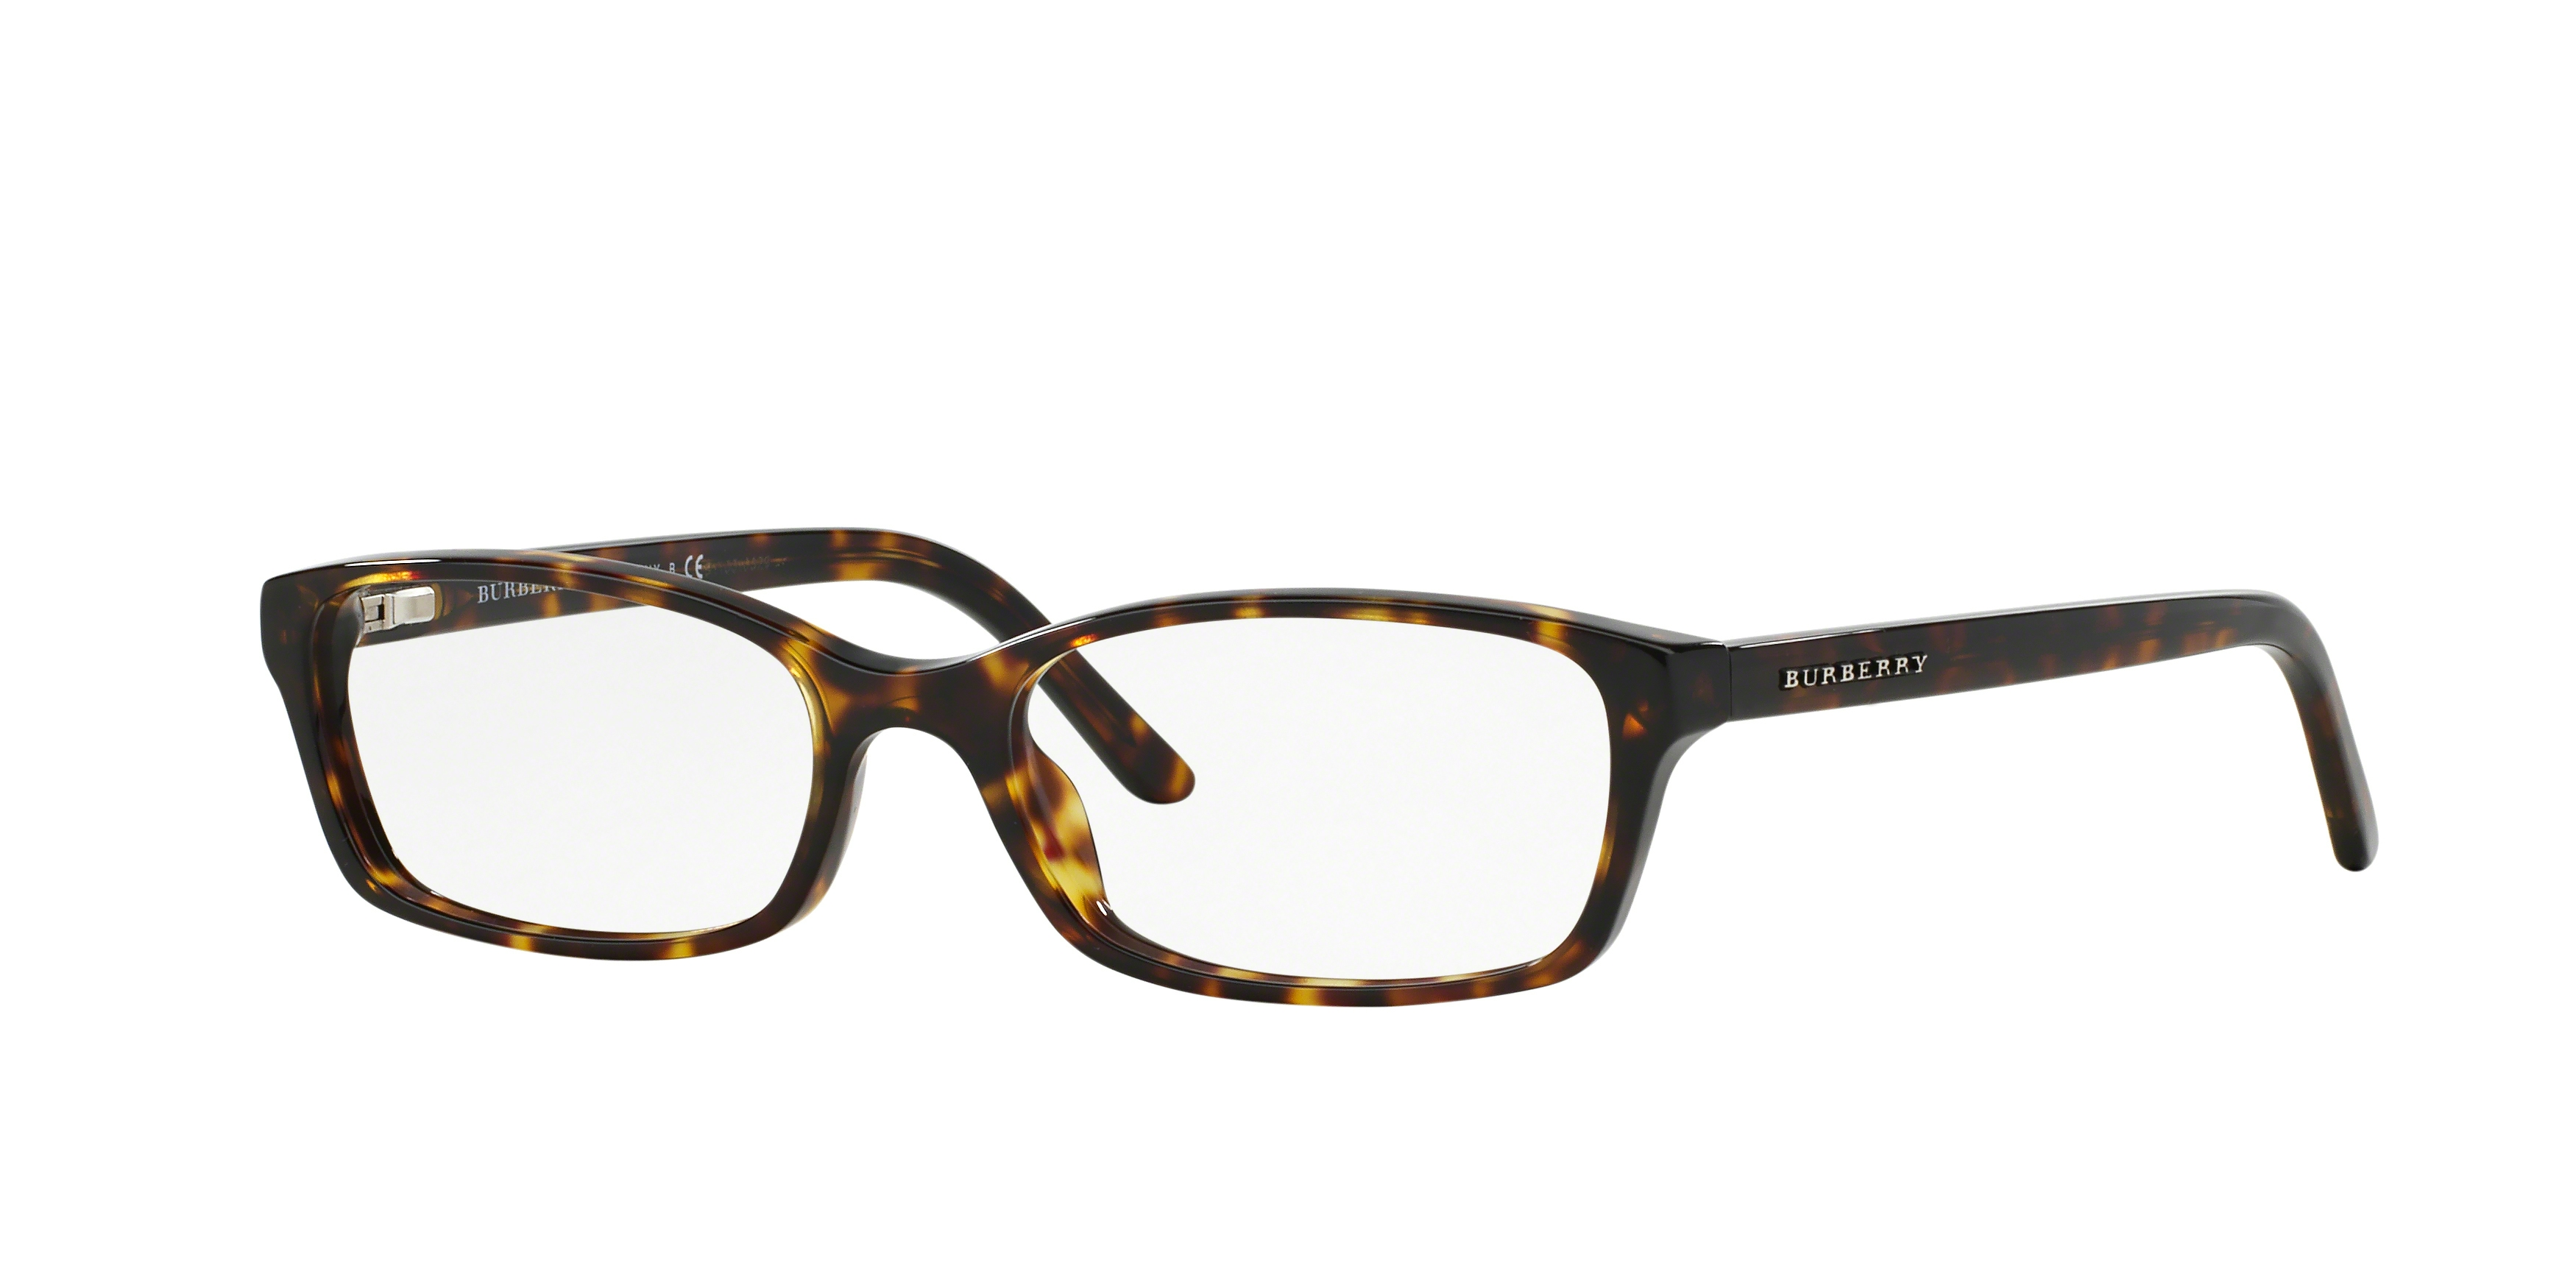 641dd43b785 Burberry Eyeglass Frames Be2073 Free S H 3002 53 3164